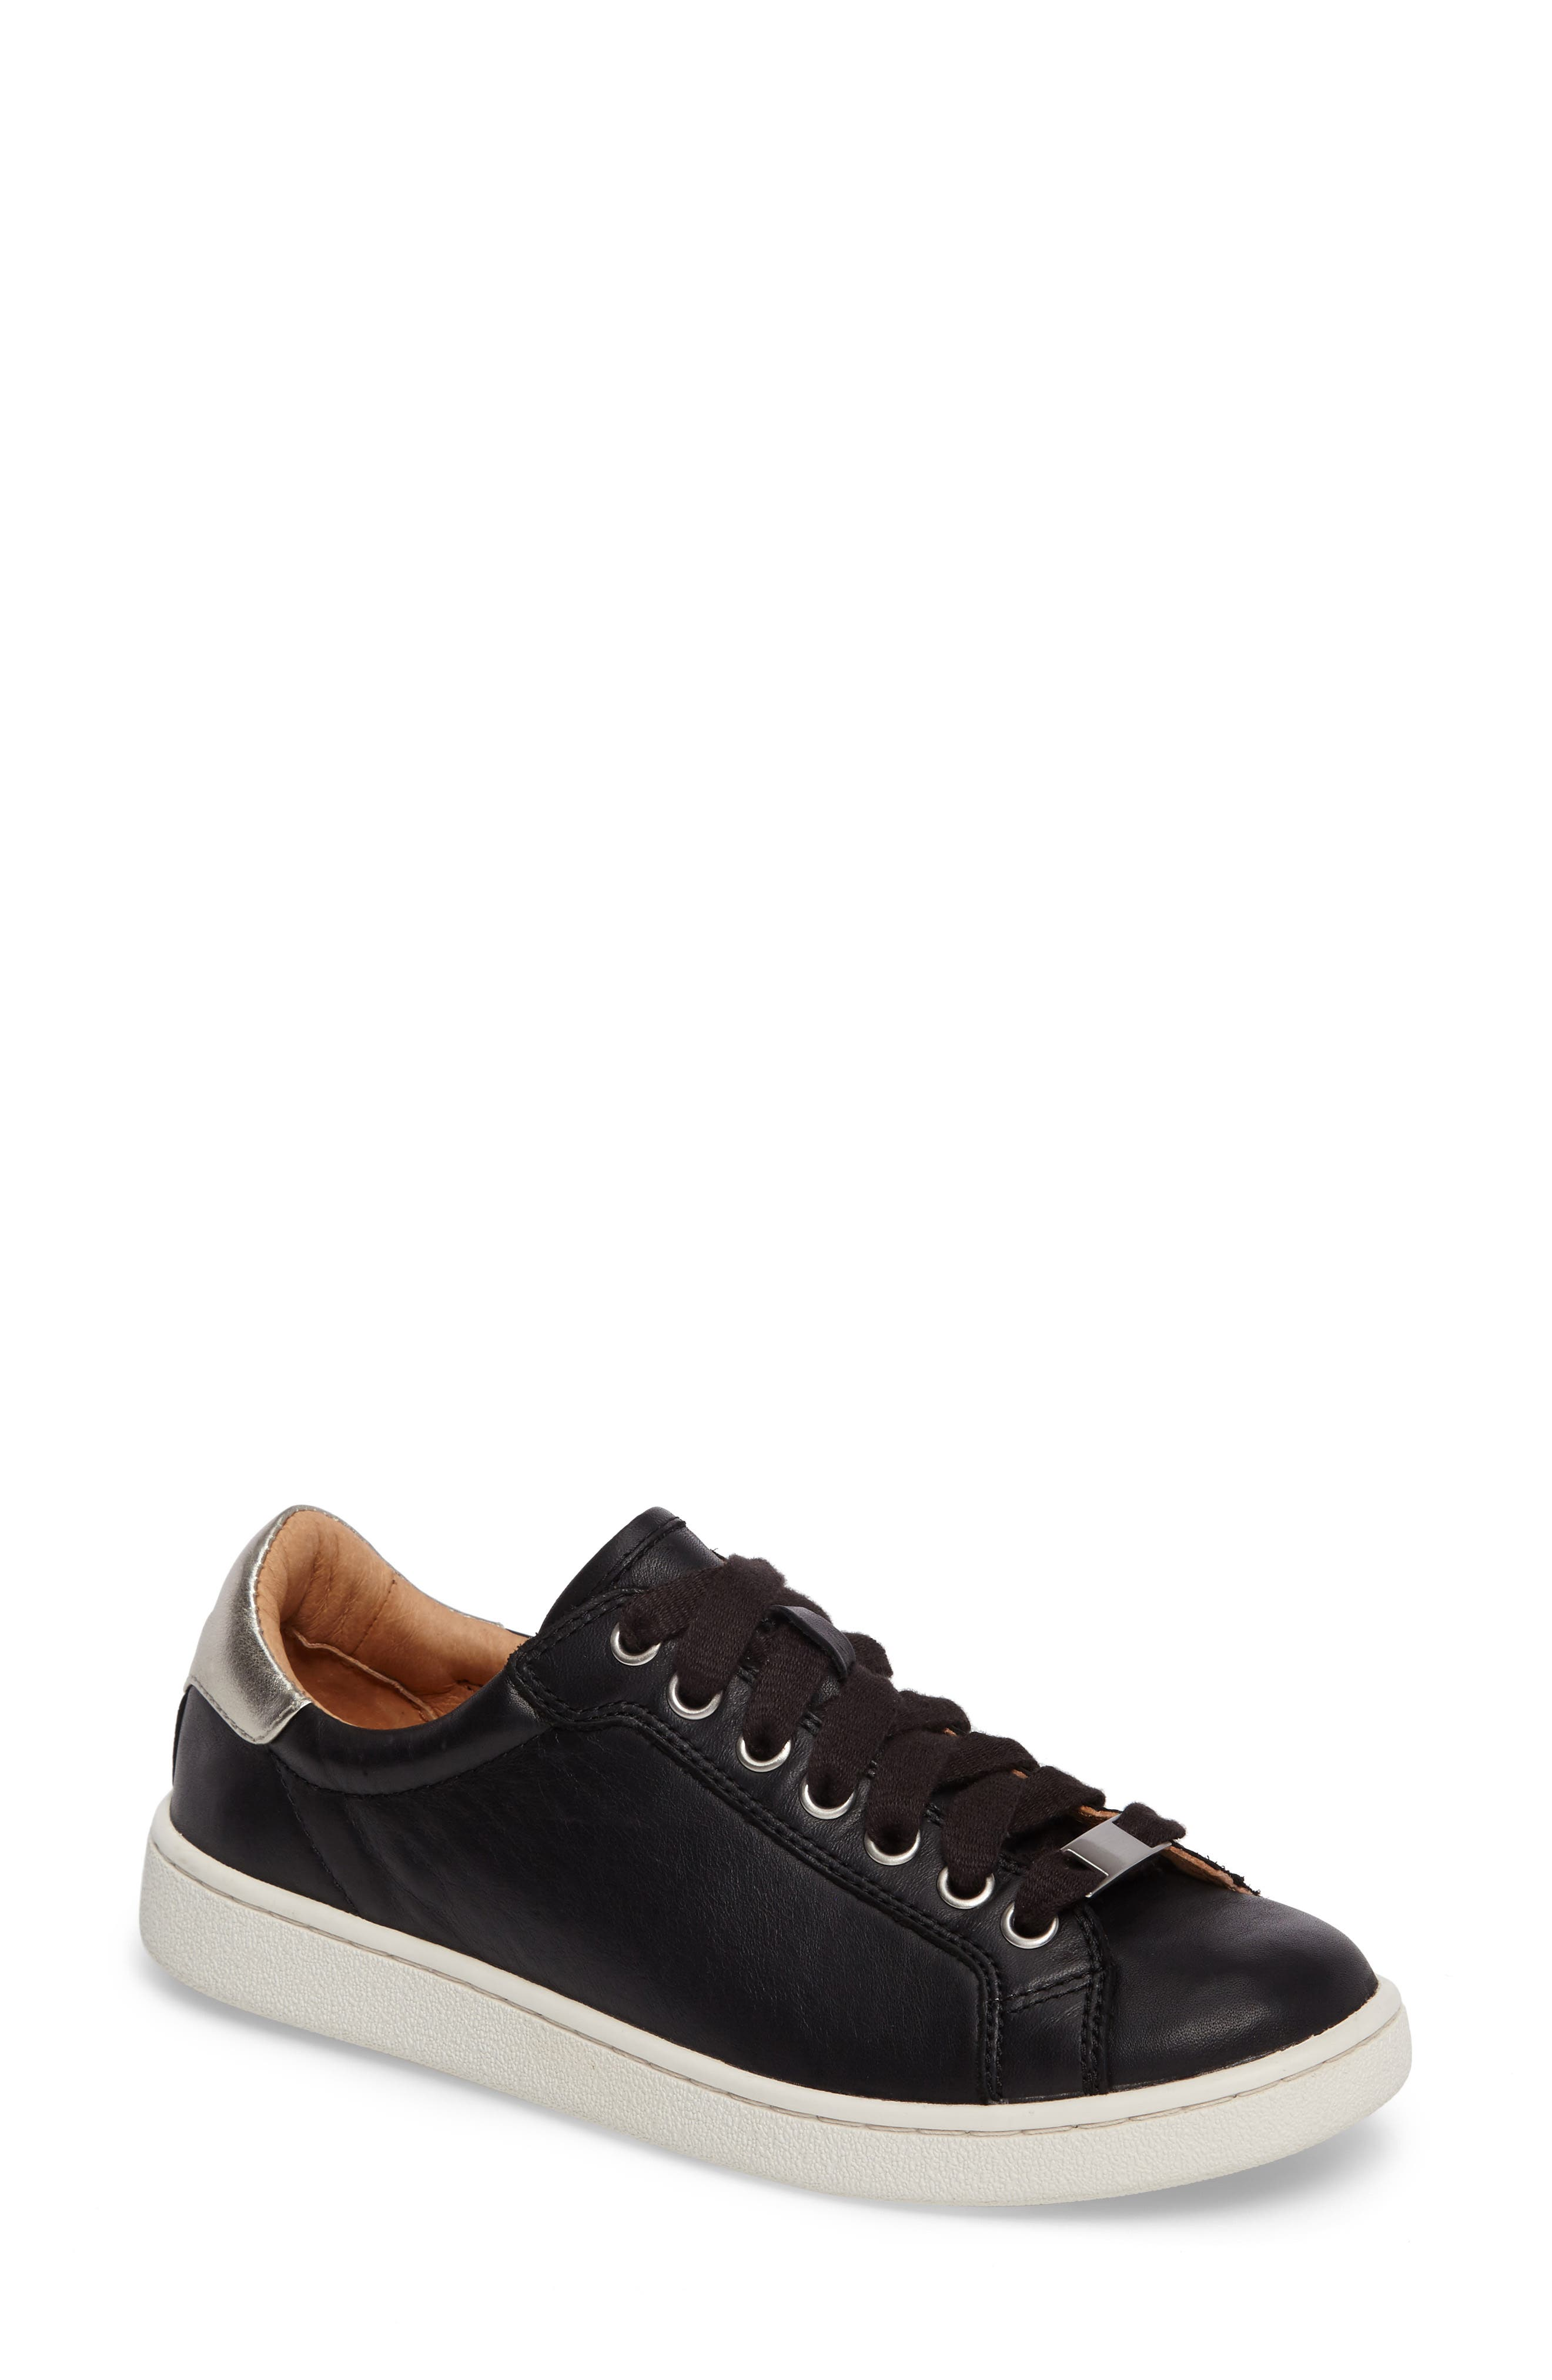 Milo Sneaker,                         Main,                         color, BLACK LEATHER